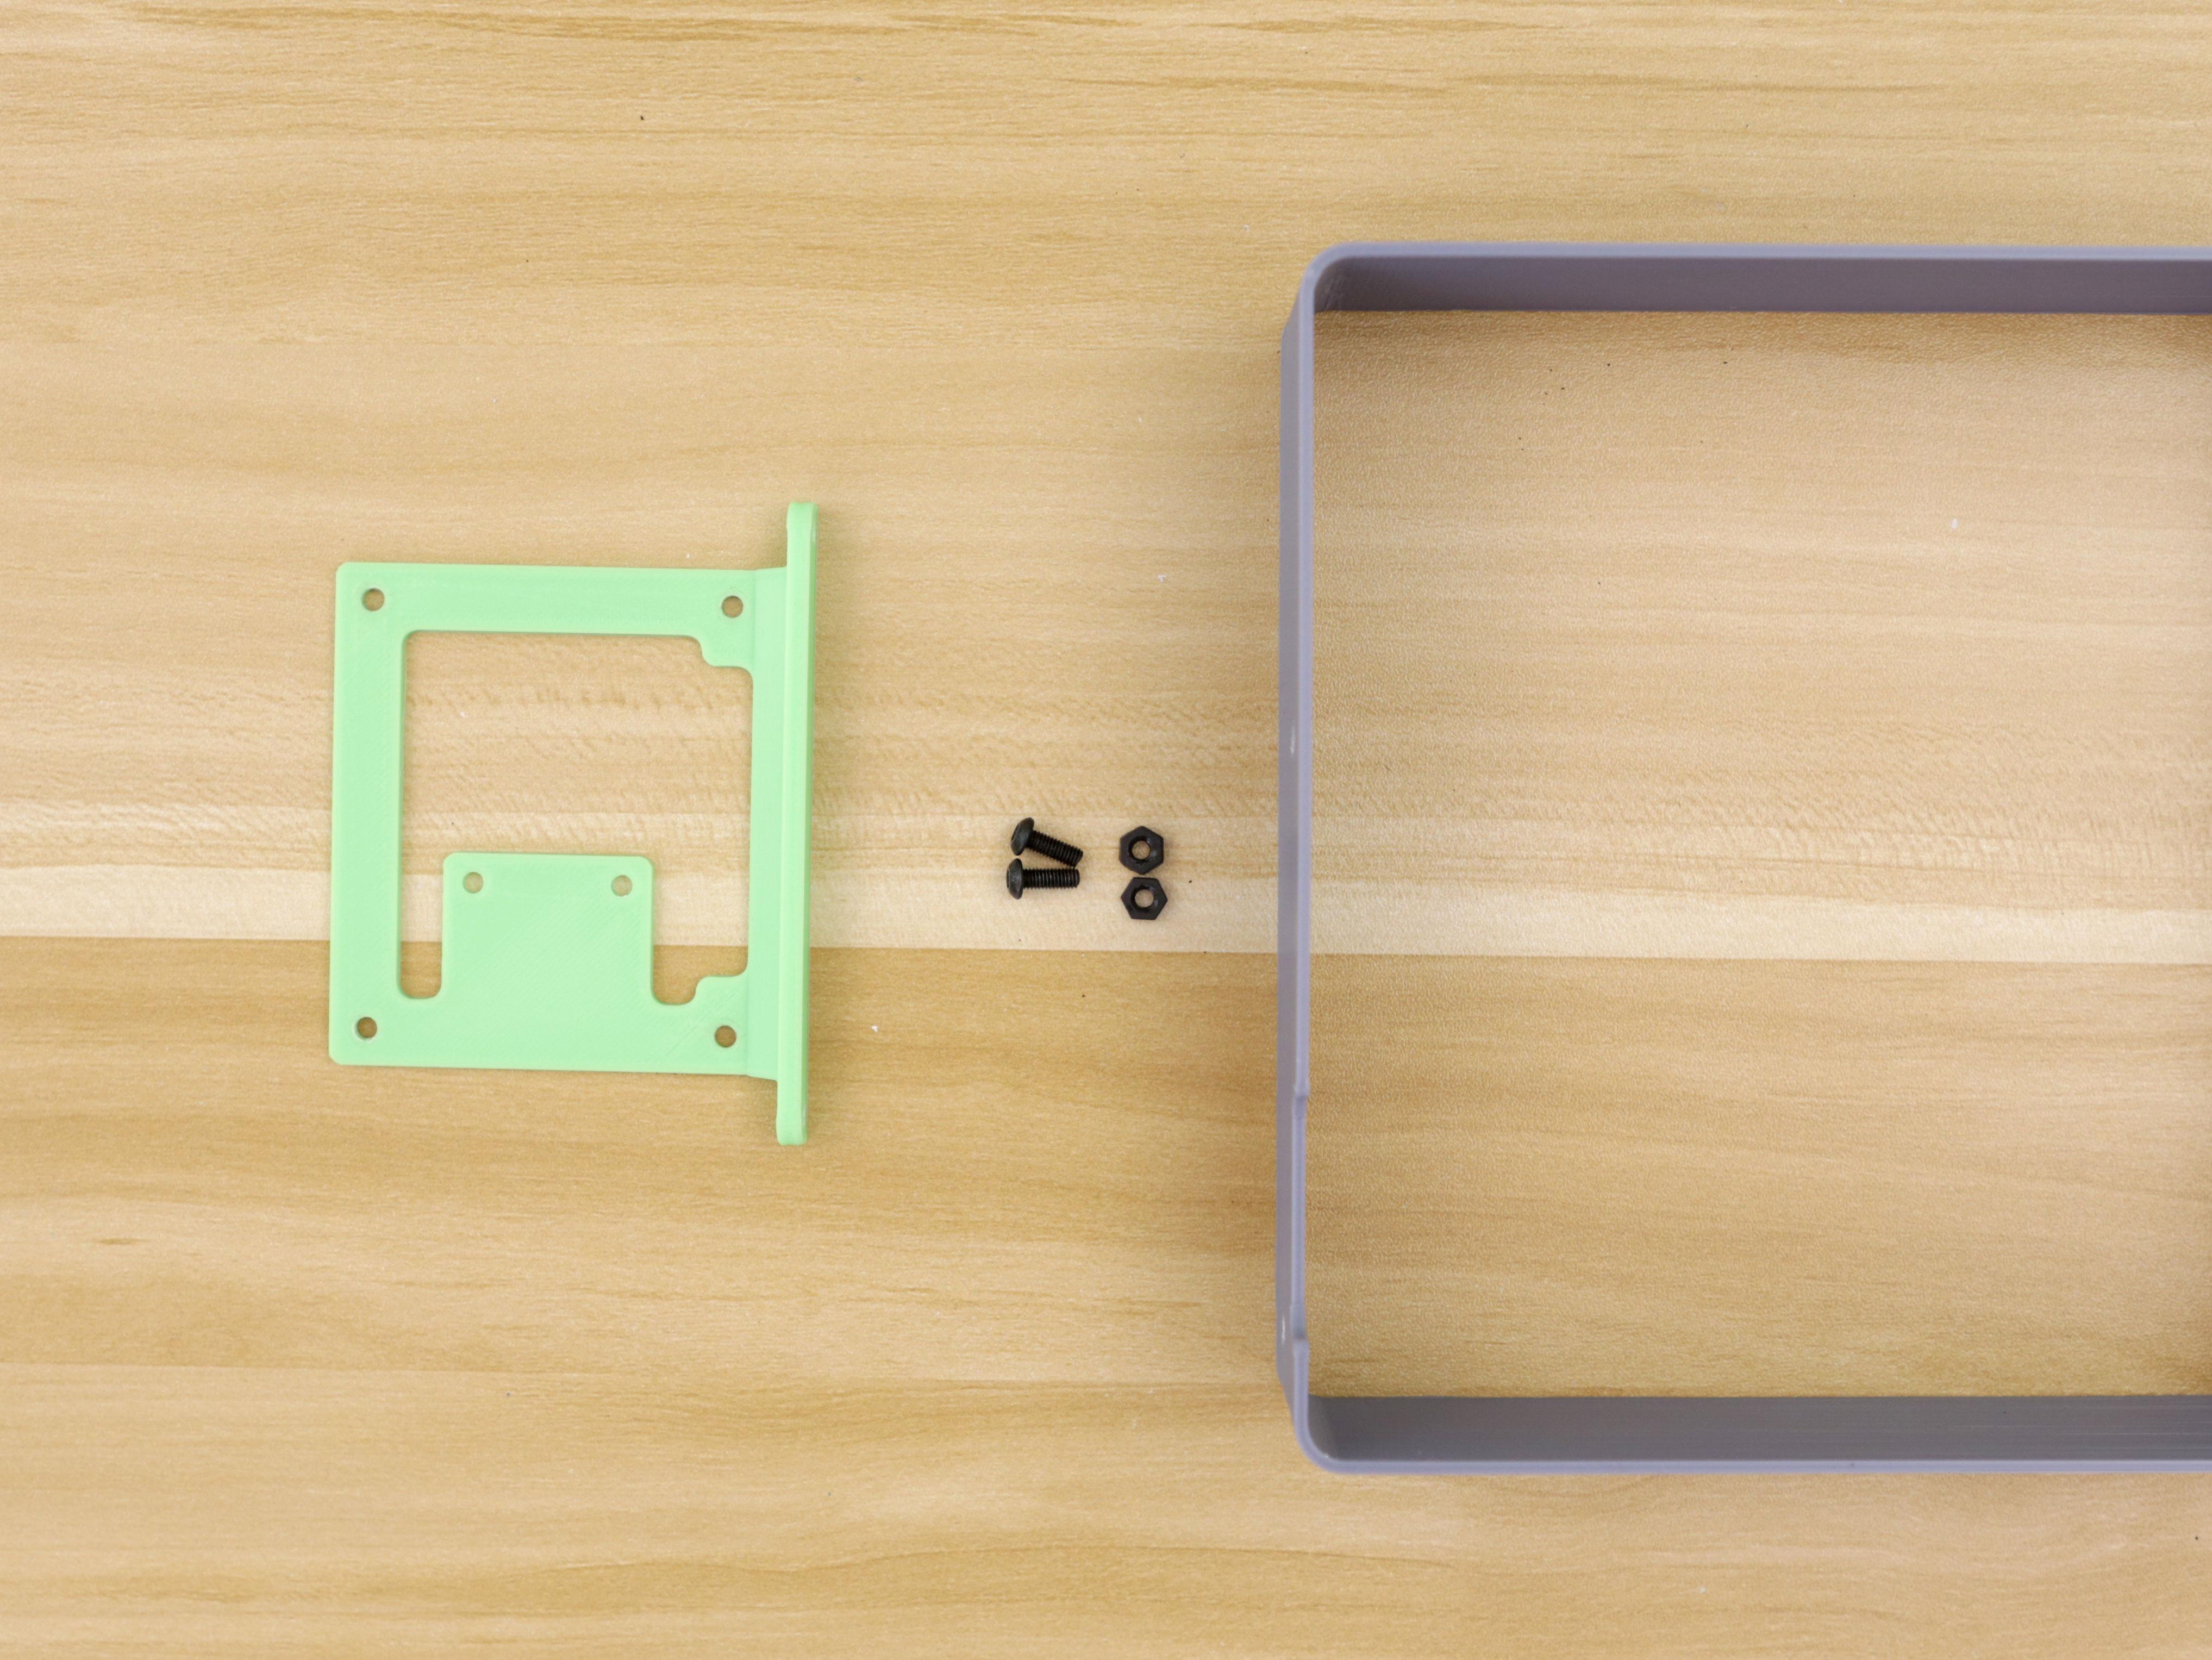 3d_printing_frame-pcbmount-screws.jpg